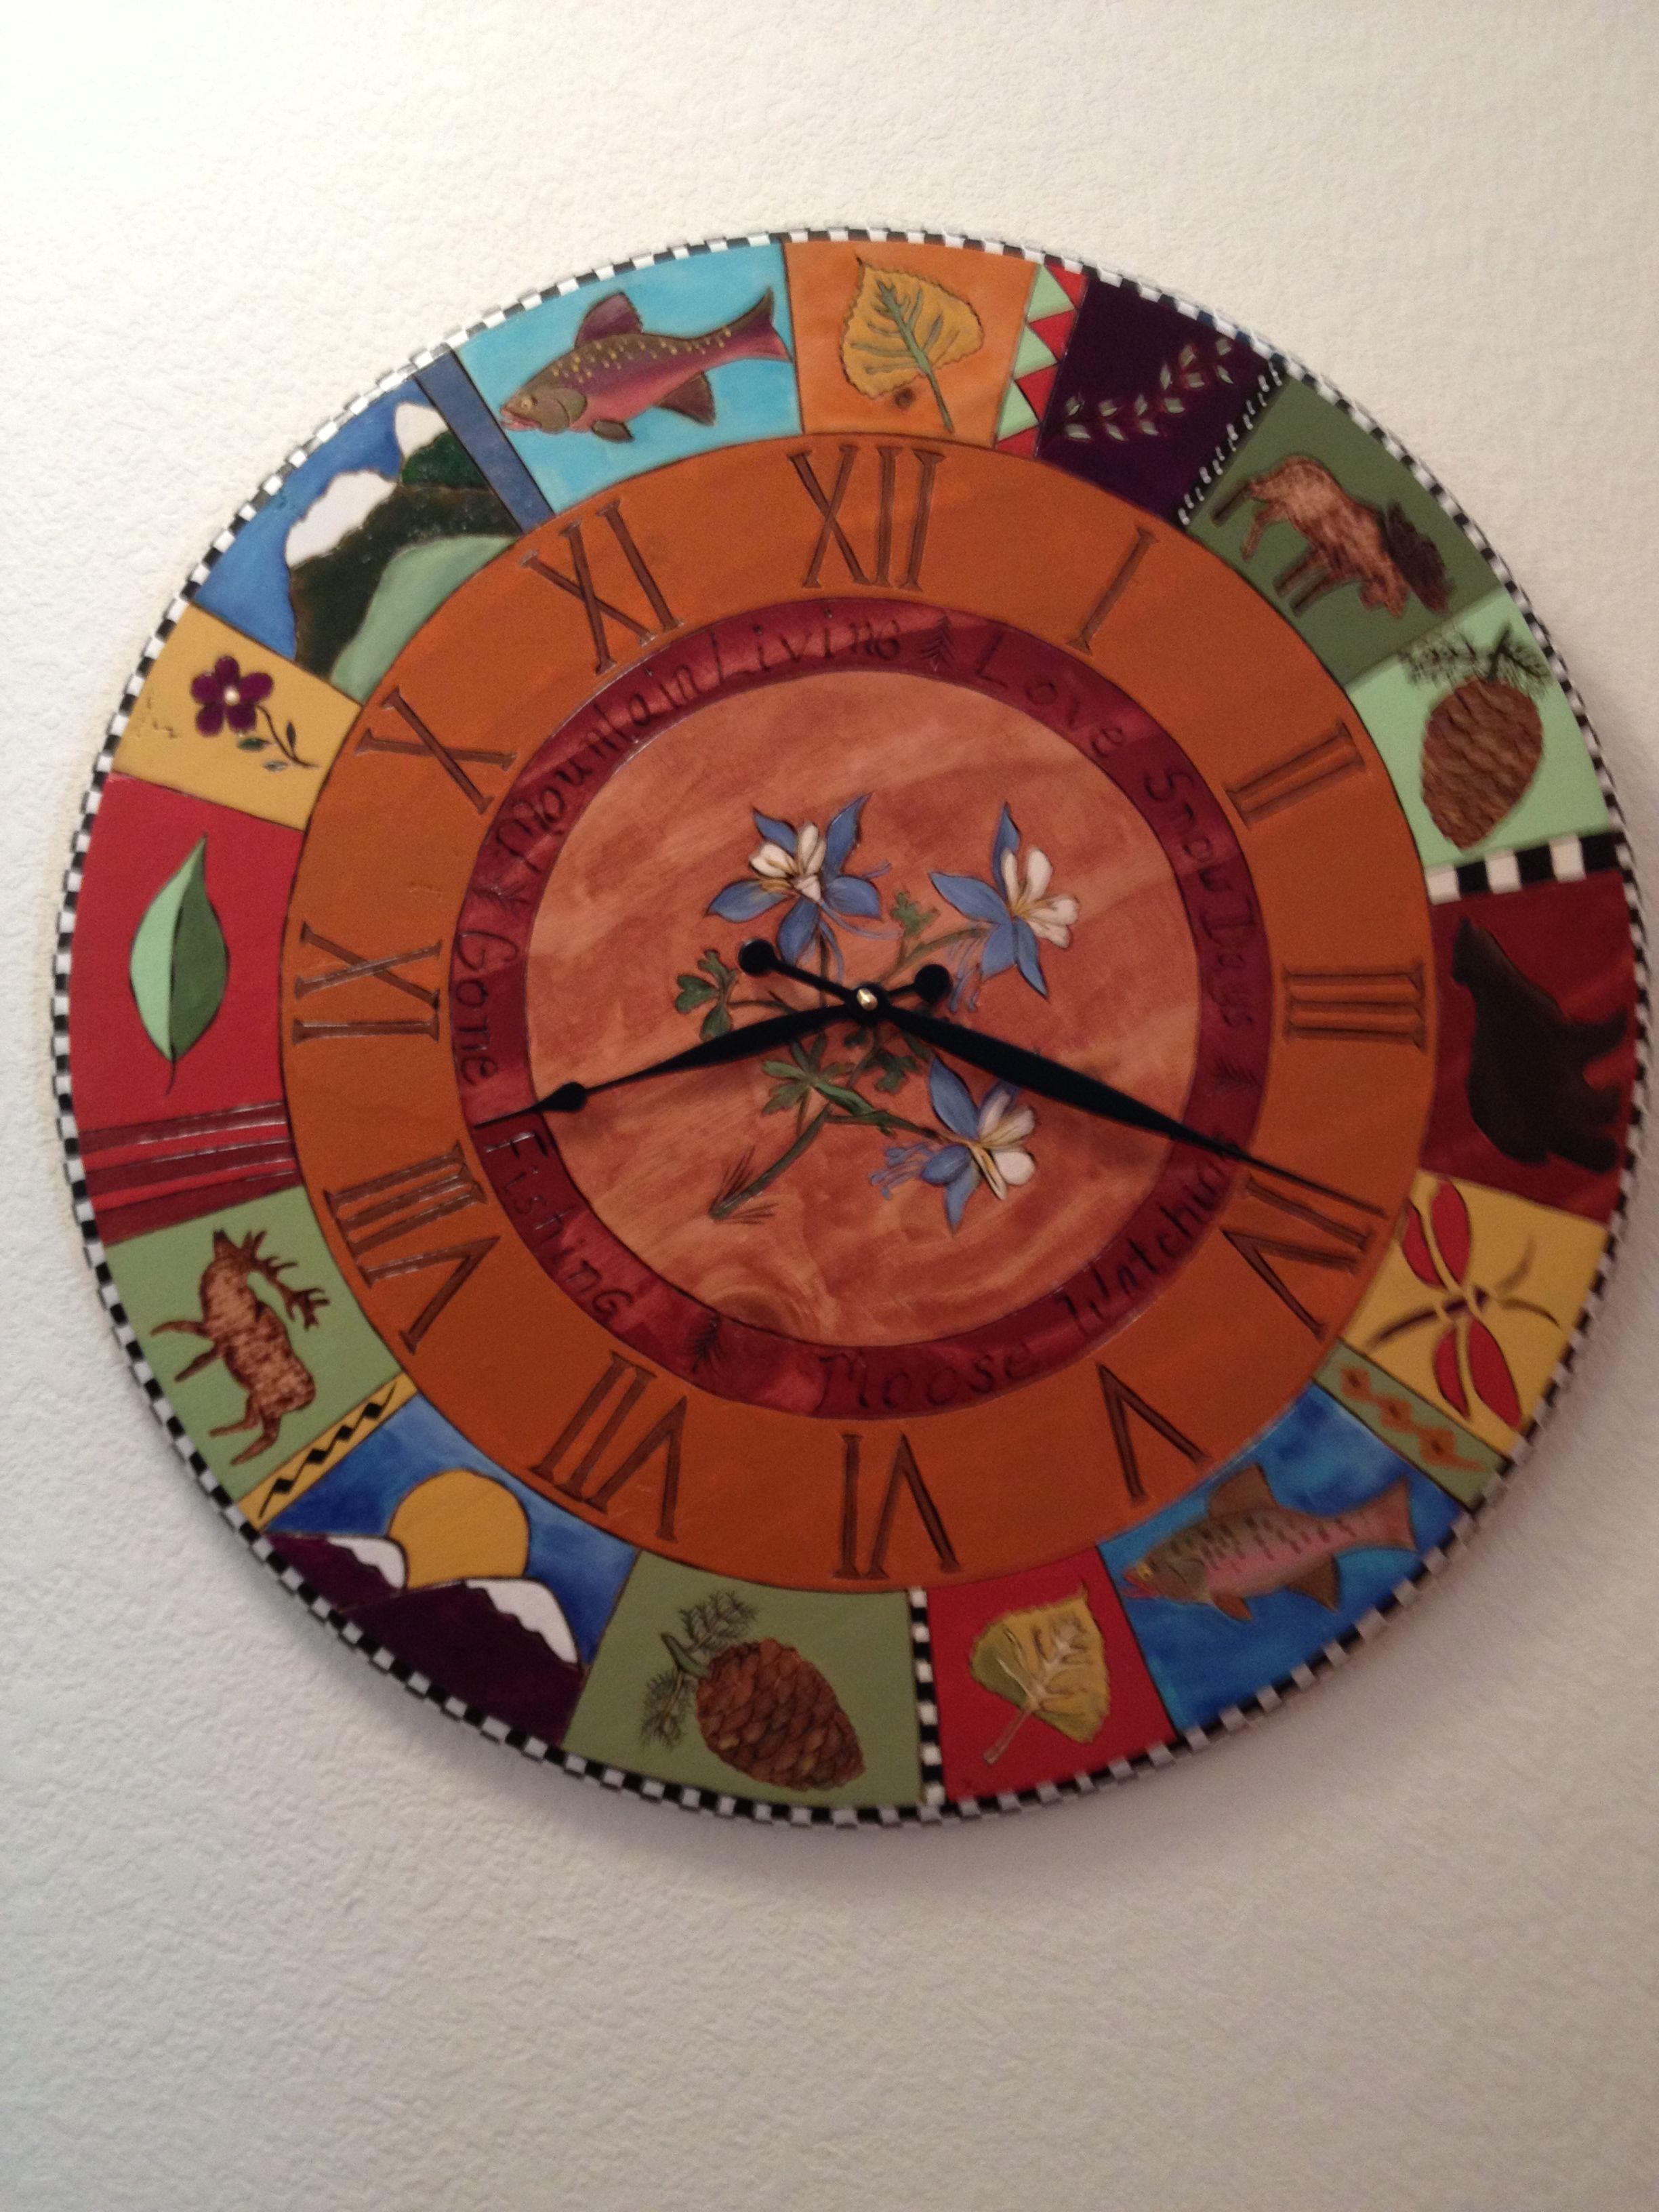 Loved Making This Mountain Theme Clock 24 Round Solid Wood Ninasartdesigns Com Kokopelli Art Funky Furniture Fused Glass